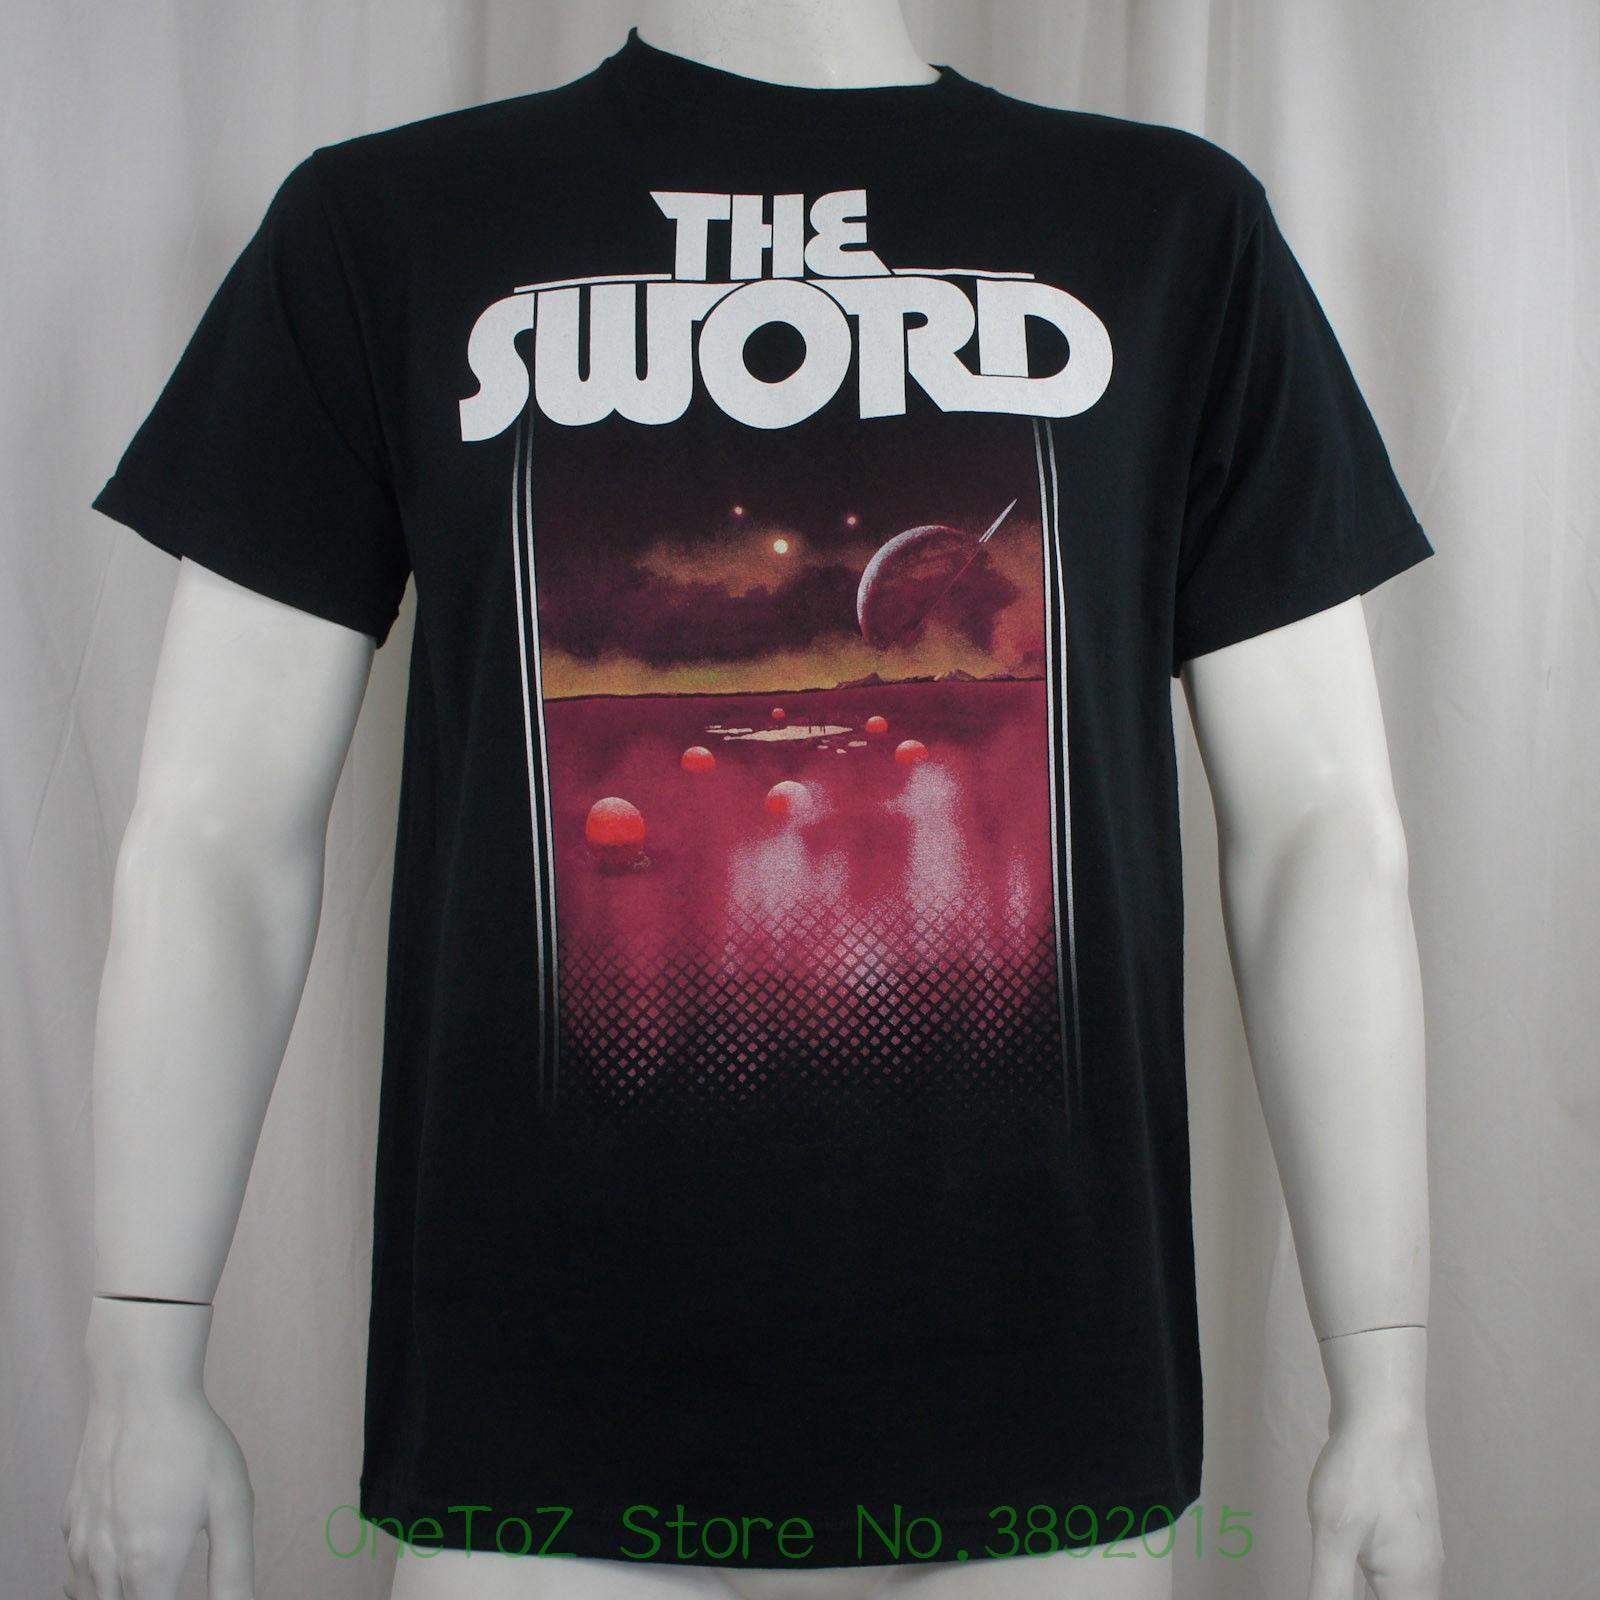 New Fashion Men's T-shirt Authentic The Sword Band Acheron Logo T-shirt S M  L Xl 2xl New